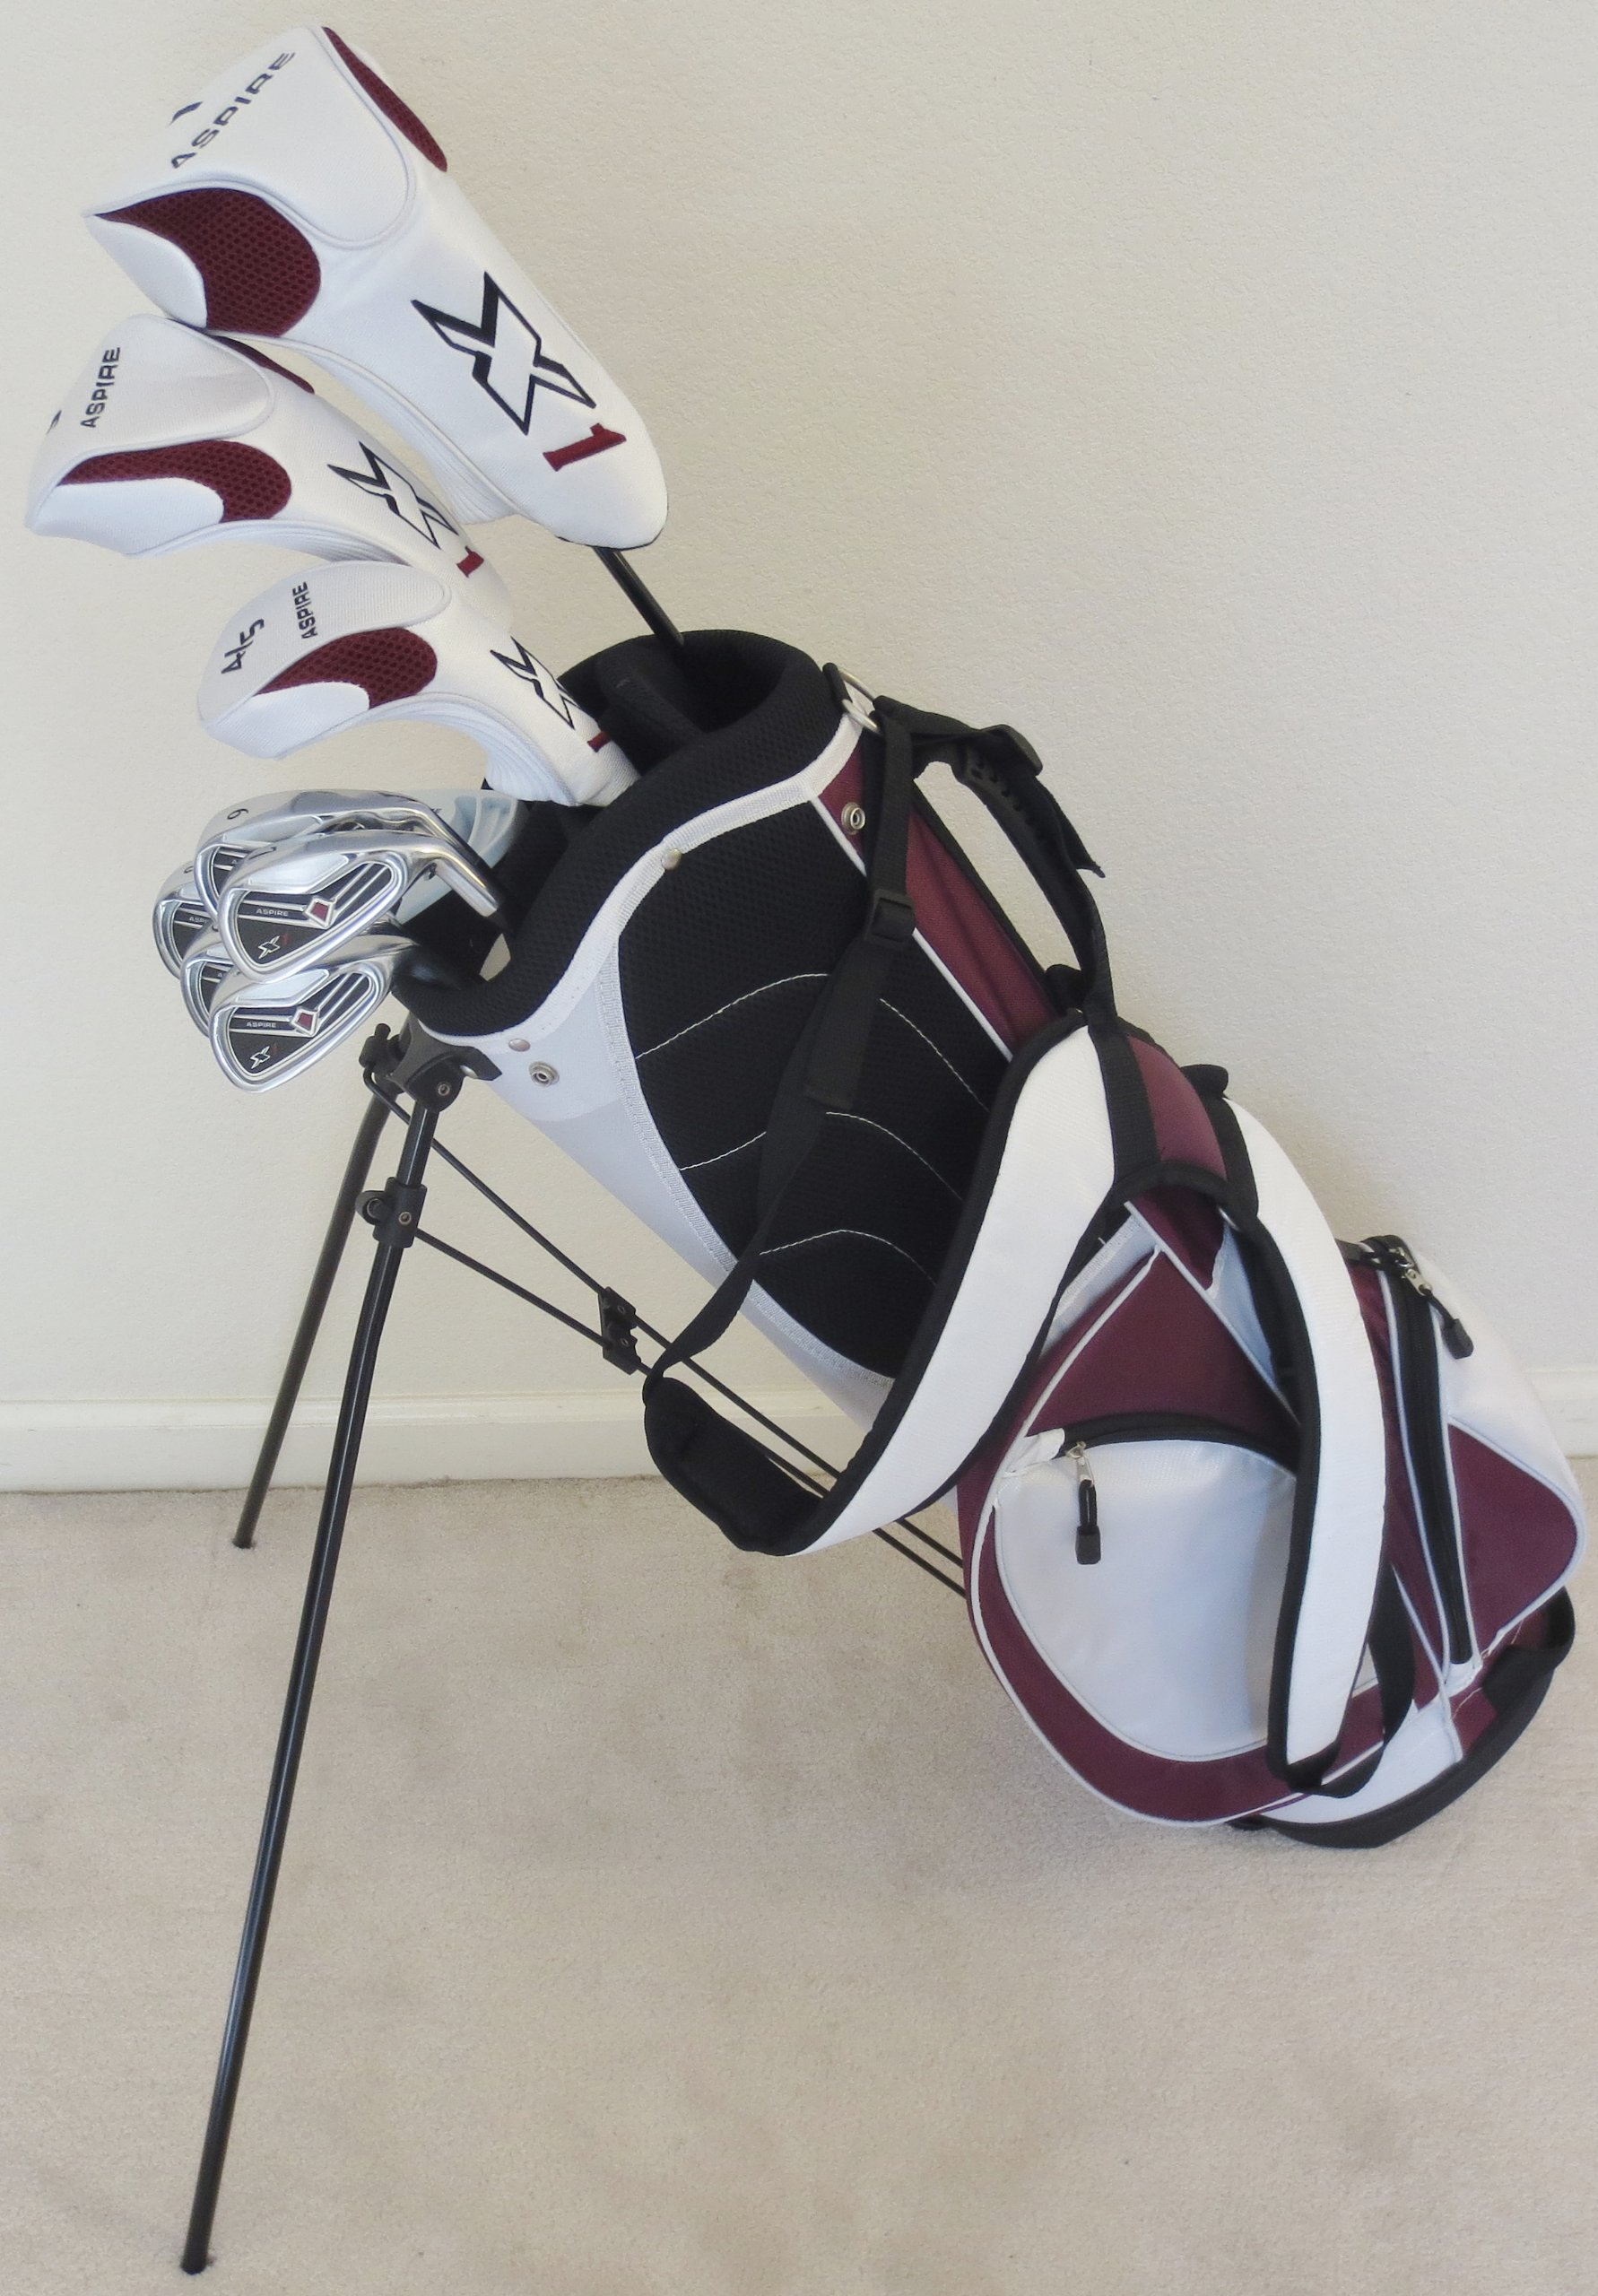 Ladies RH Complete Golf Club Set Driver, Fairway Wood, Hybrid, Irons, Putter, Stand Bag